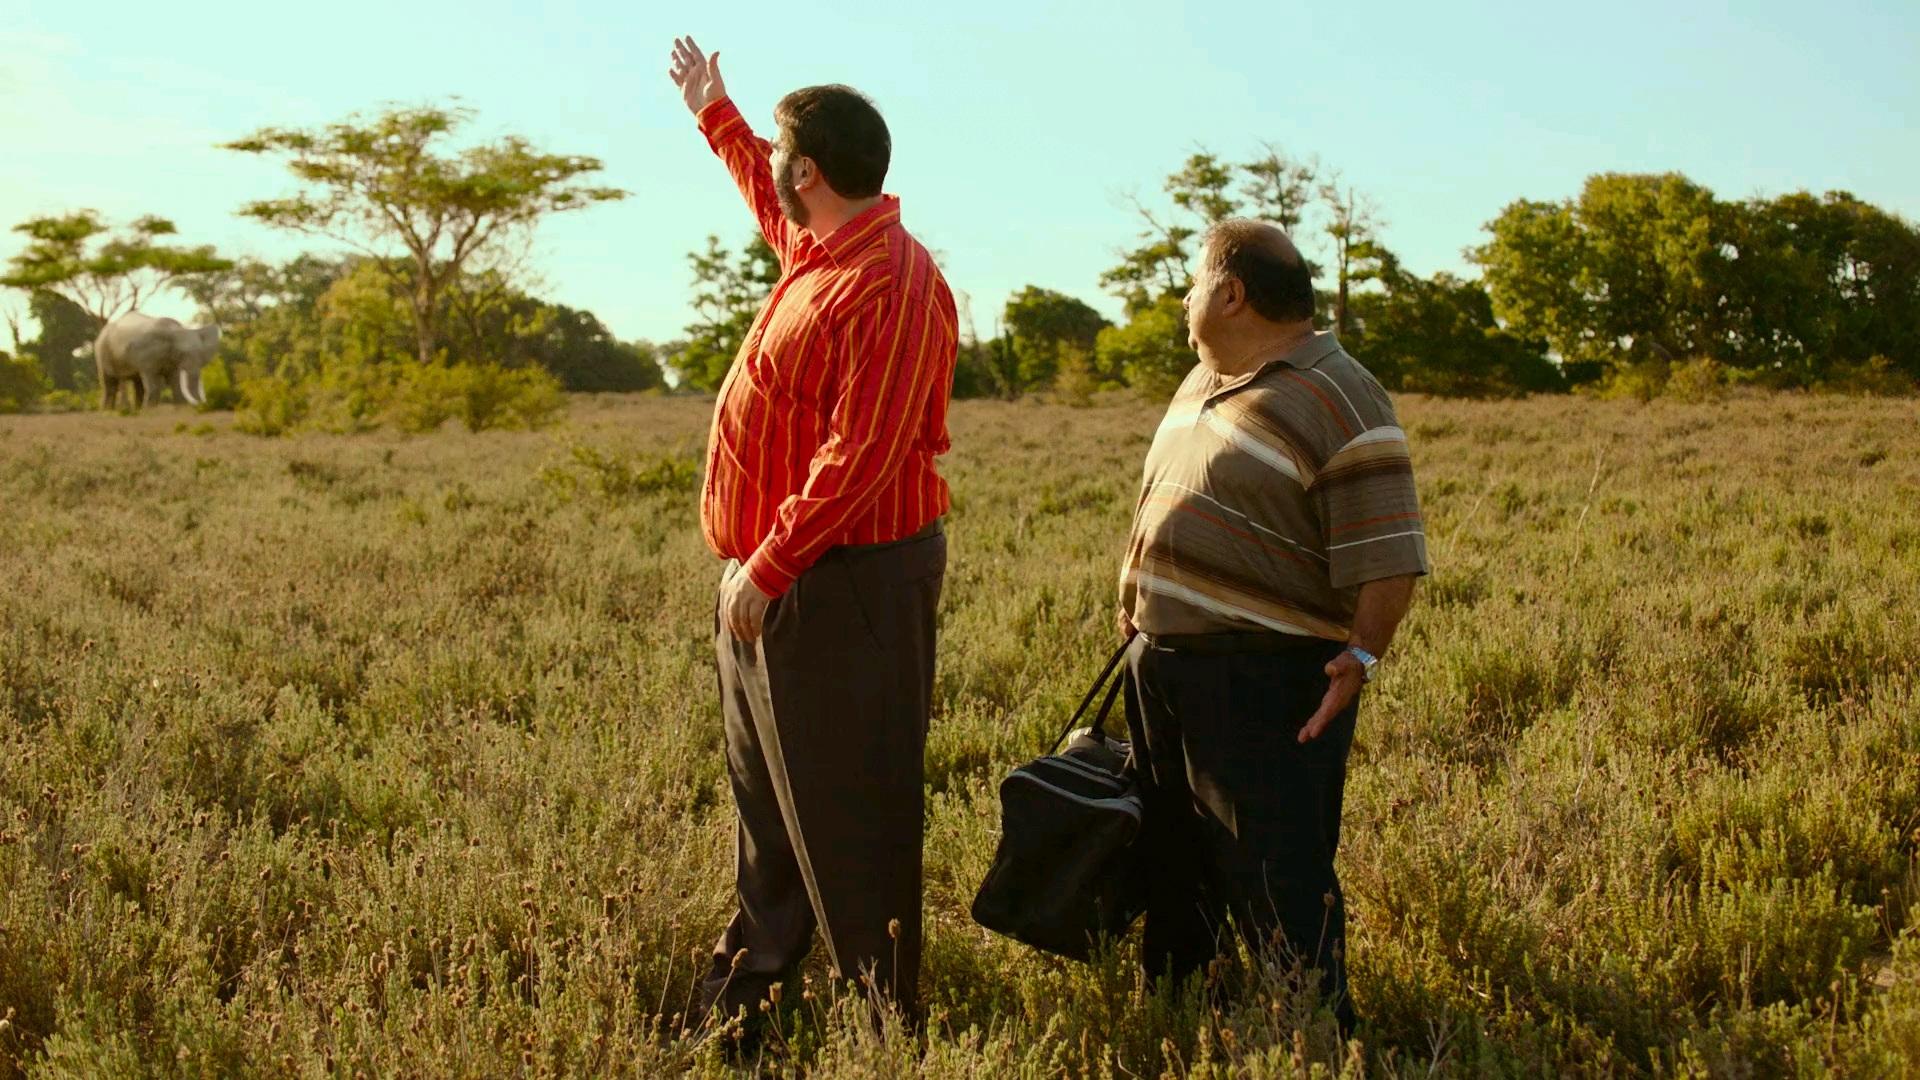 Recep İvedik 6 | 2019 | Yerli Film | WEB-DL | XviD | Sansürsüz | 1080p - m720p - m1080p | WEB-DL | Tek Link